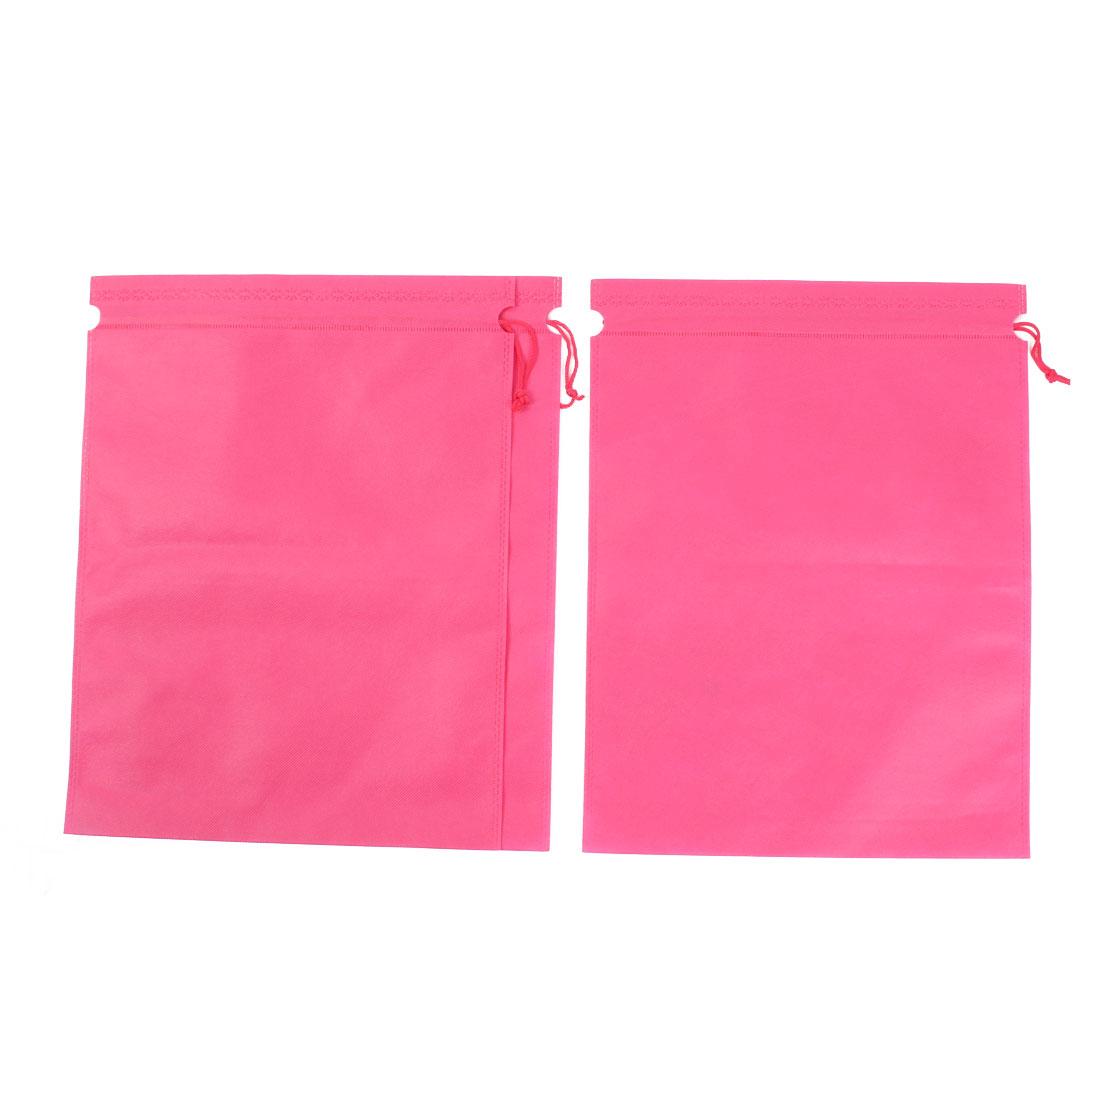 Non-woven Fabric Drawstring Clothes Shoes Sundry Storage Bag Organizer Holder Fuchsia 39 x 30cm 3pcs